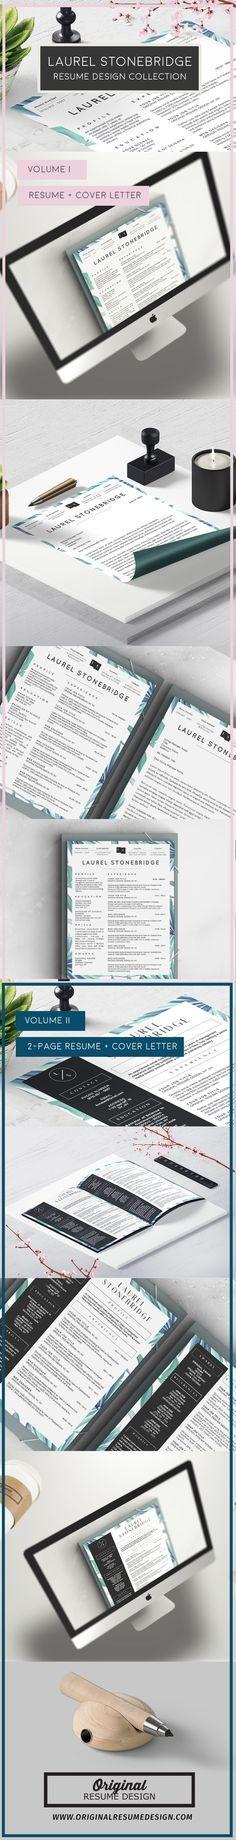 Best 25+ Budget spreadsheet template ideas on Pinterest Budget - operating budget template